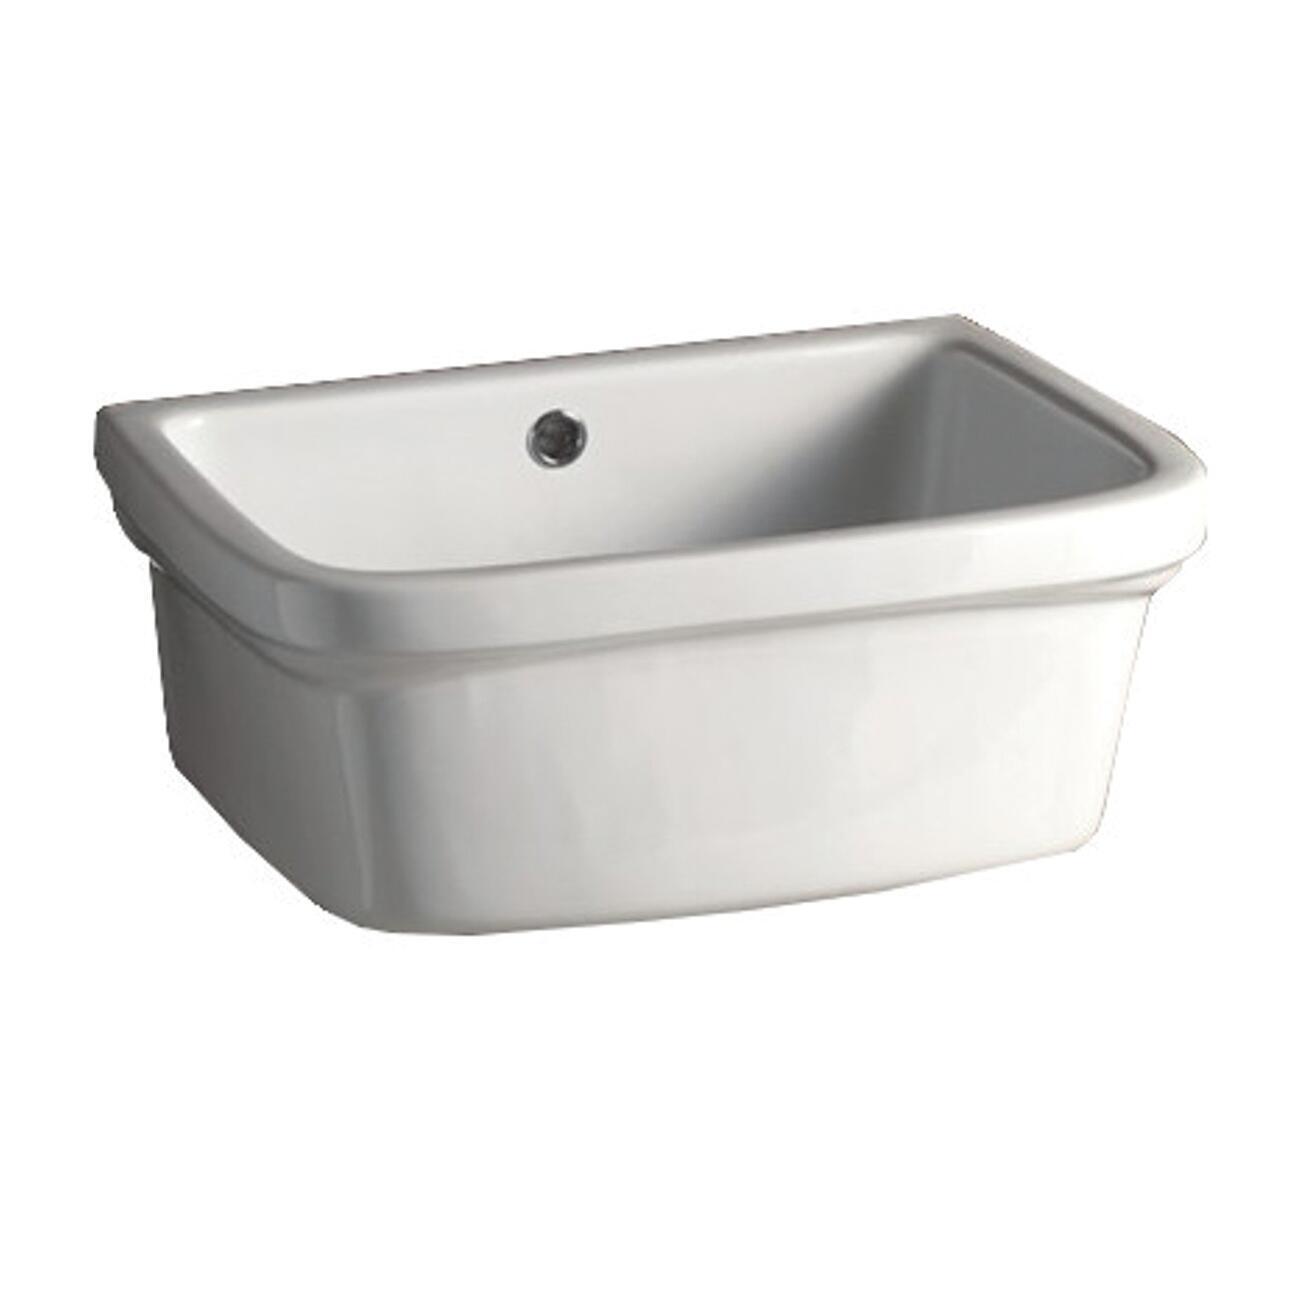 Lavatoio Per Bucato Basin Ceramic 48 X 25 X 40 Cm Leroy Merlin